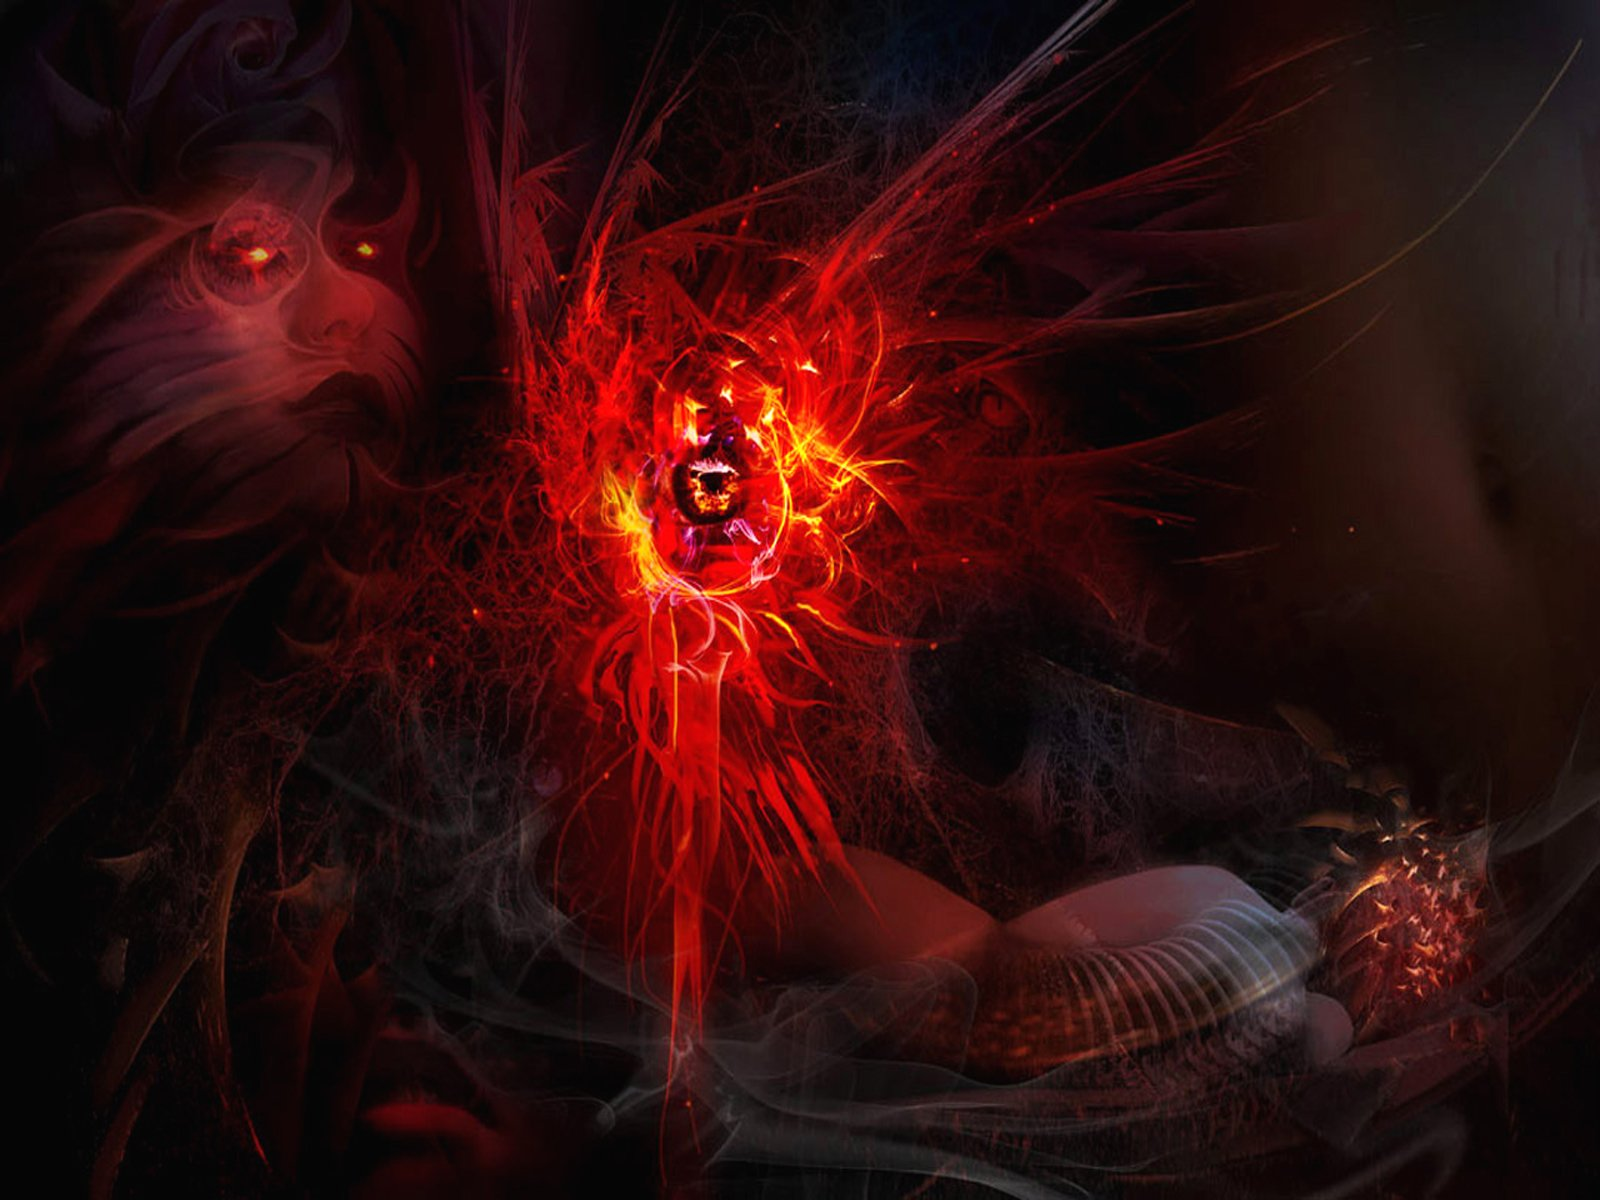 CGI - Abstrakt  Bakgrund